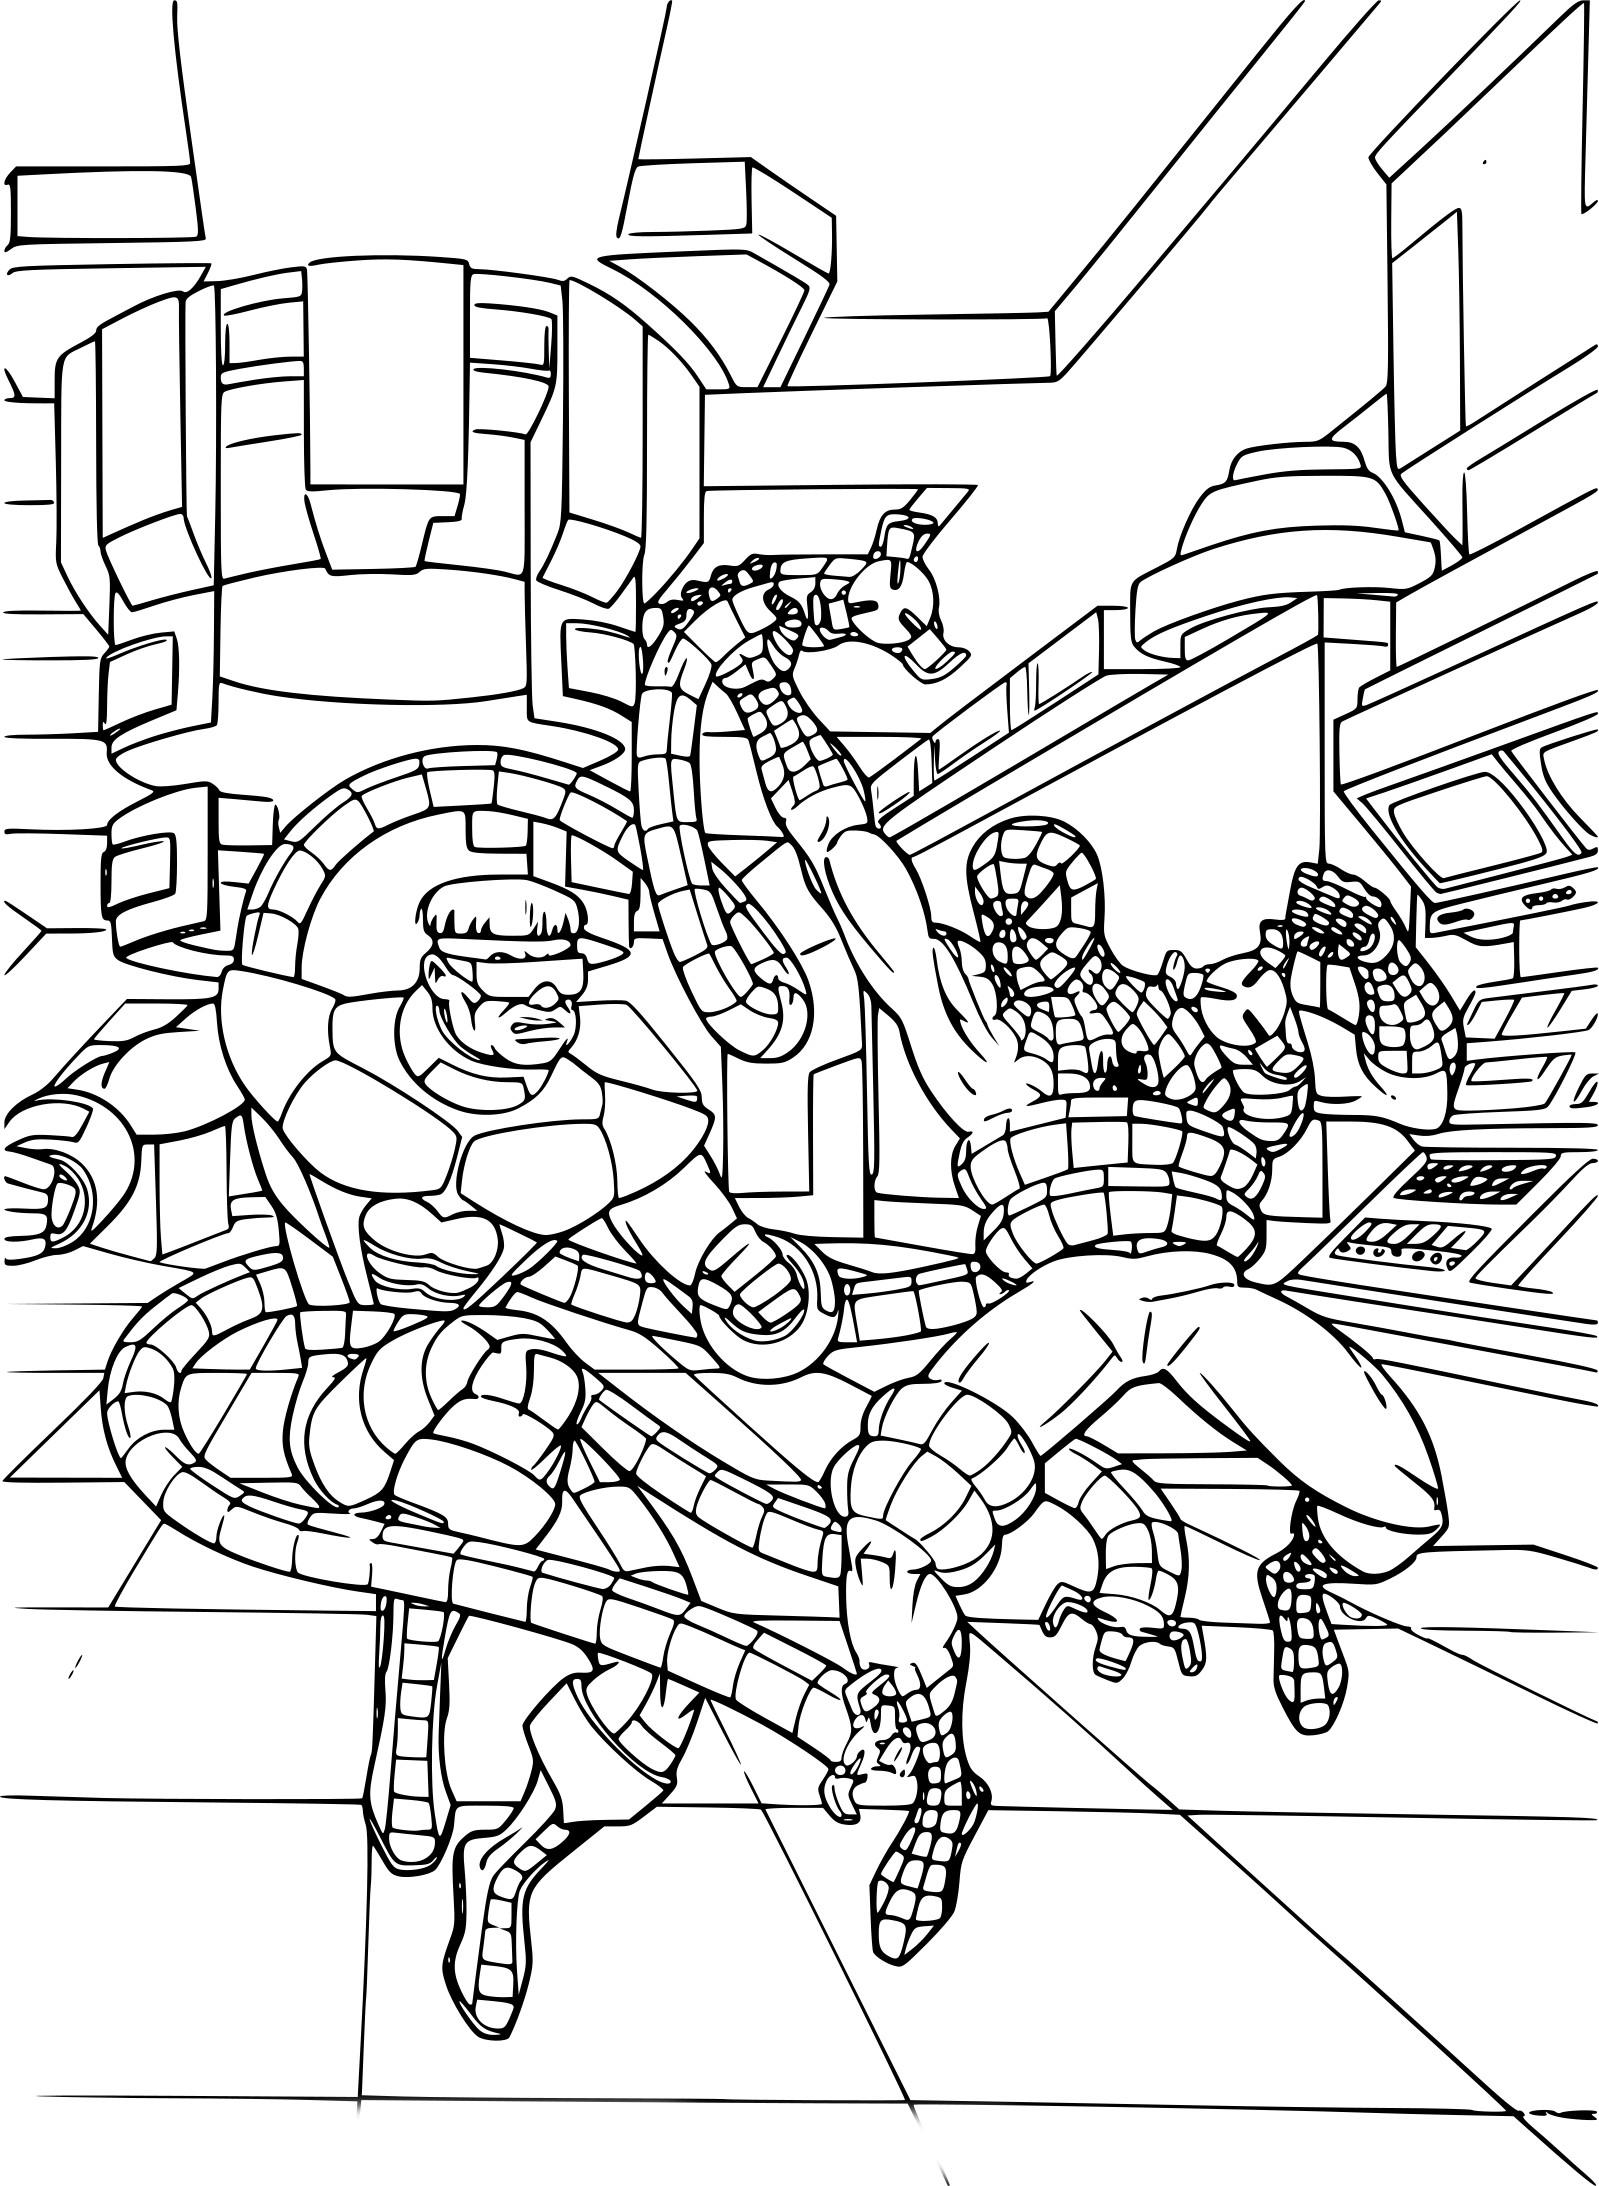 Coloriage spiderman et docteur octopus imprimer - Immagini del ragno da stampare ...